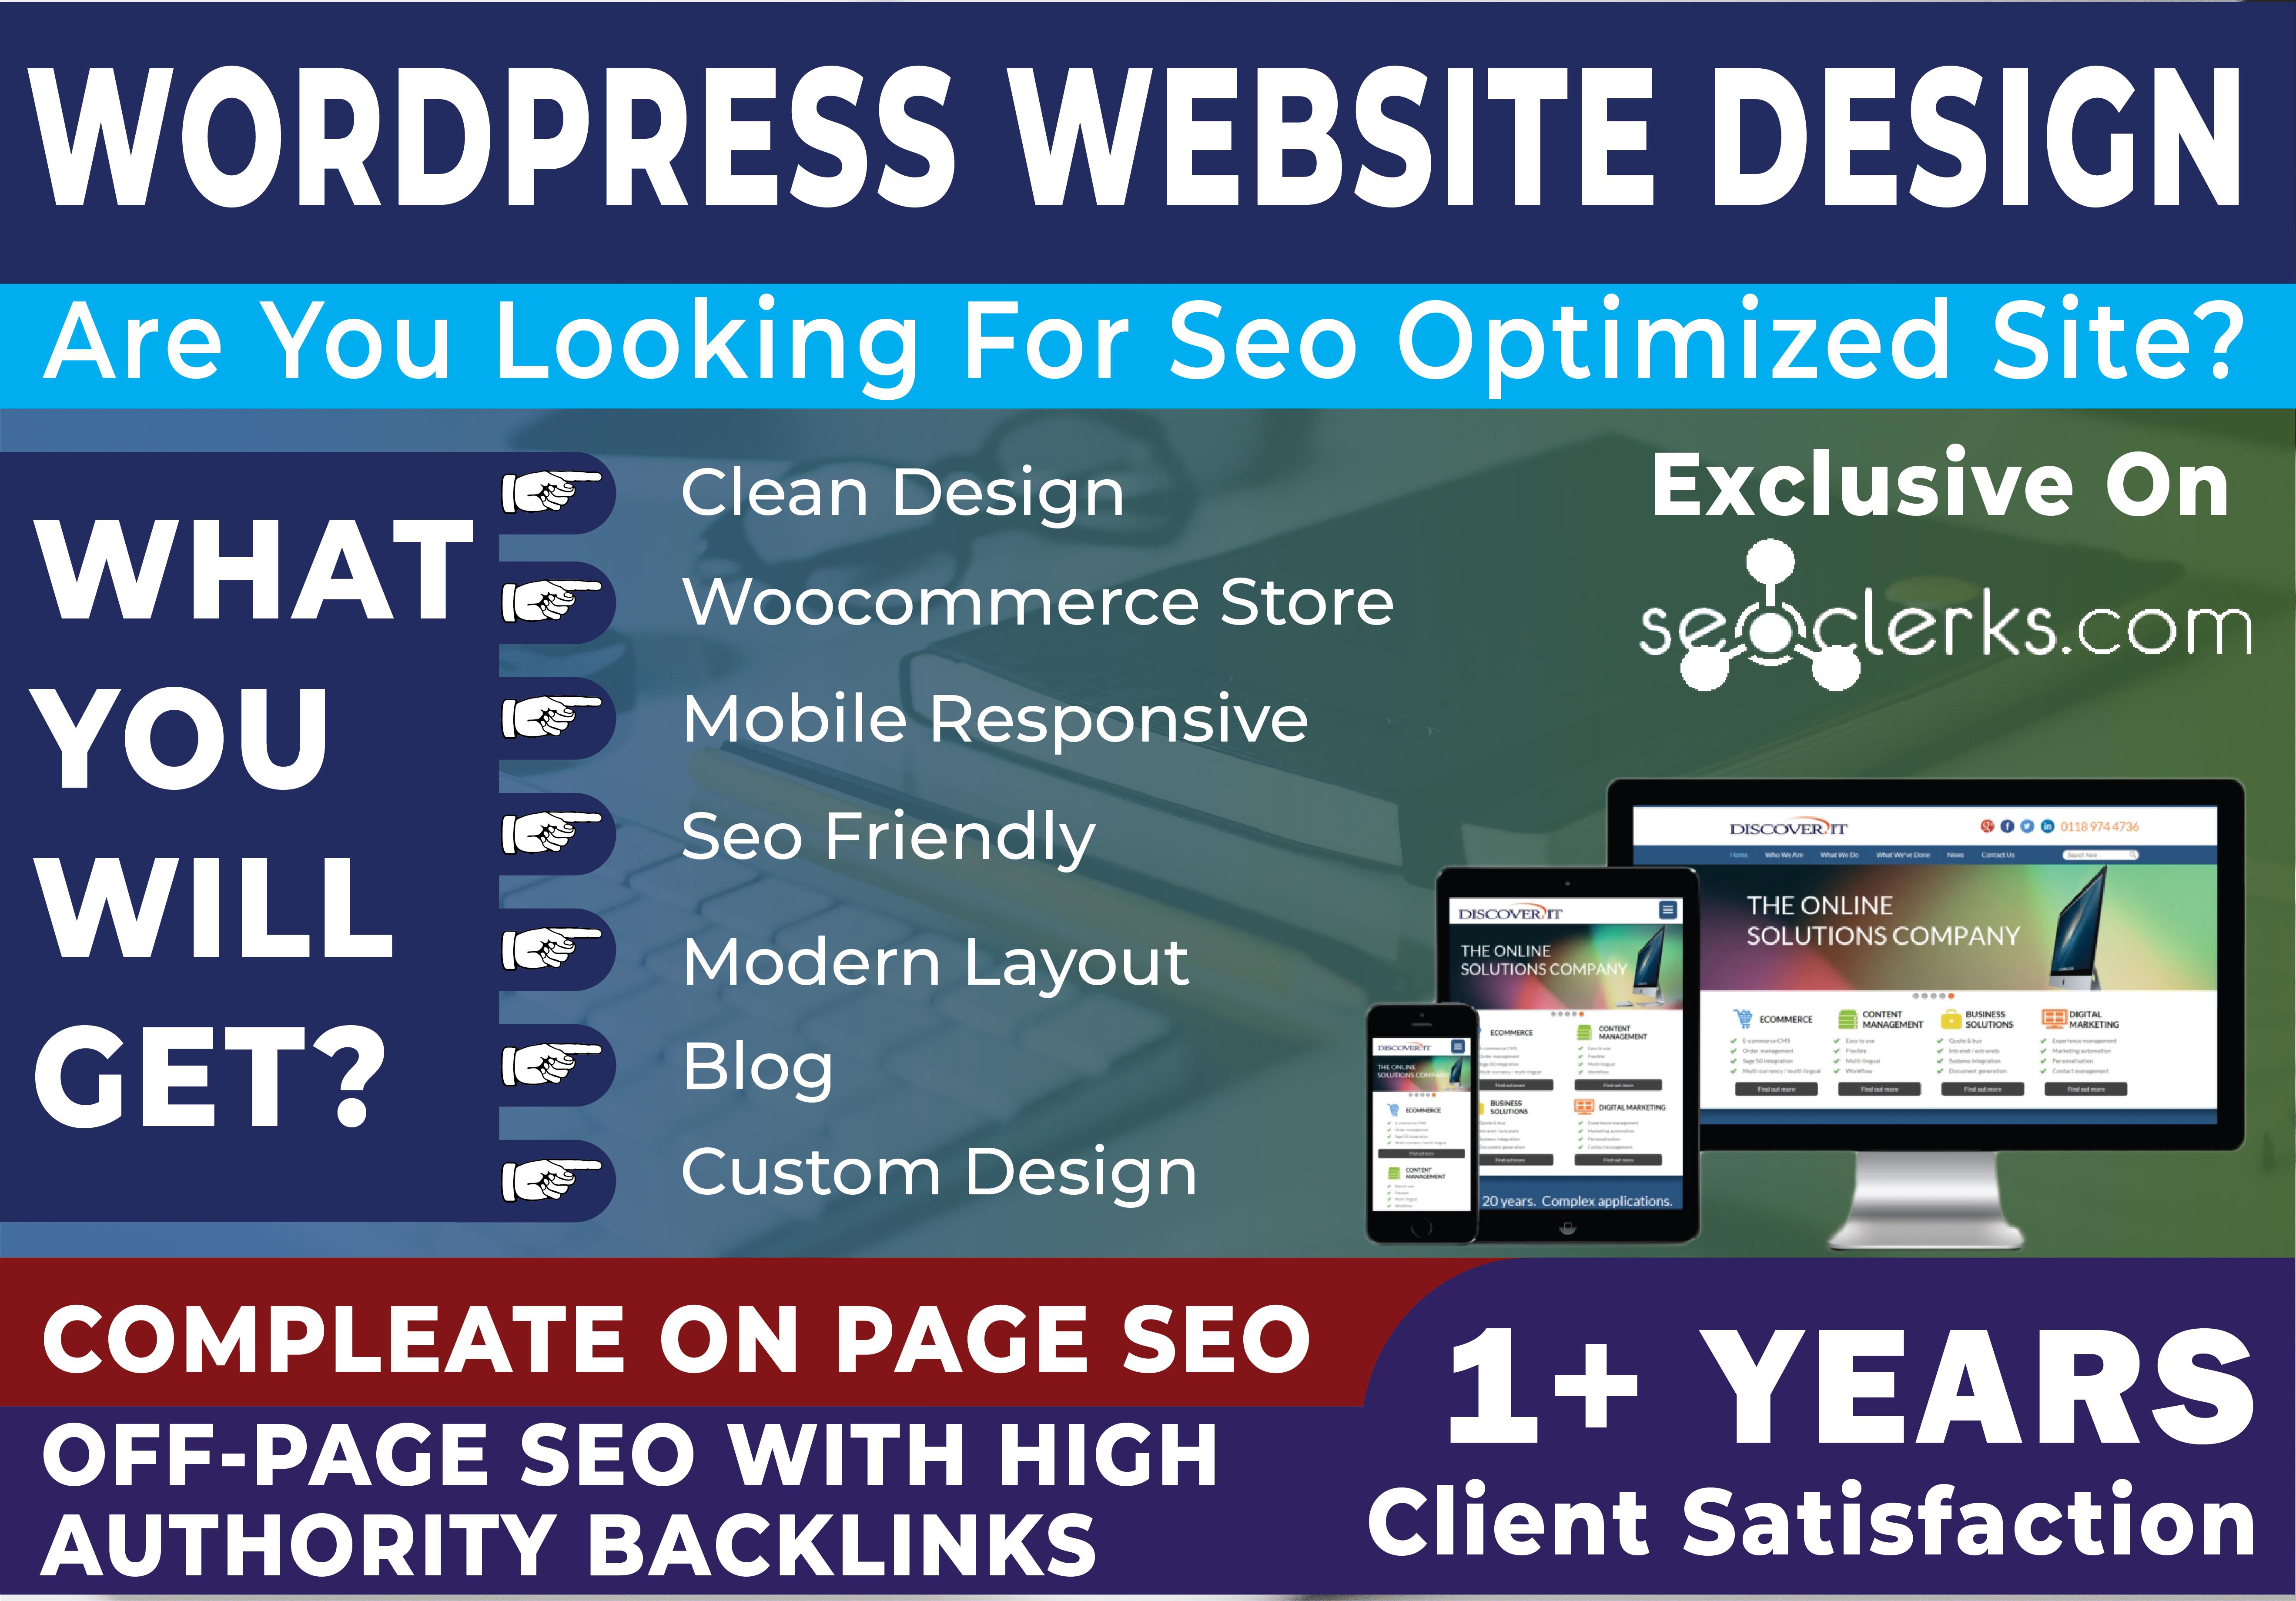 I will design a responsive WordPress website for business